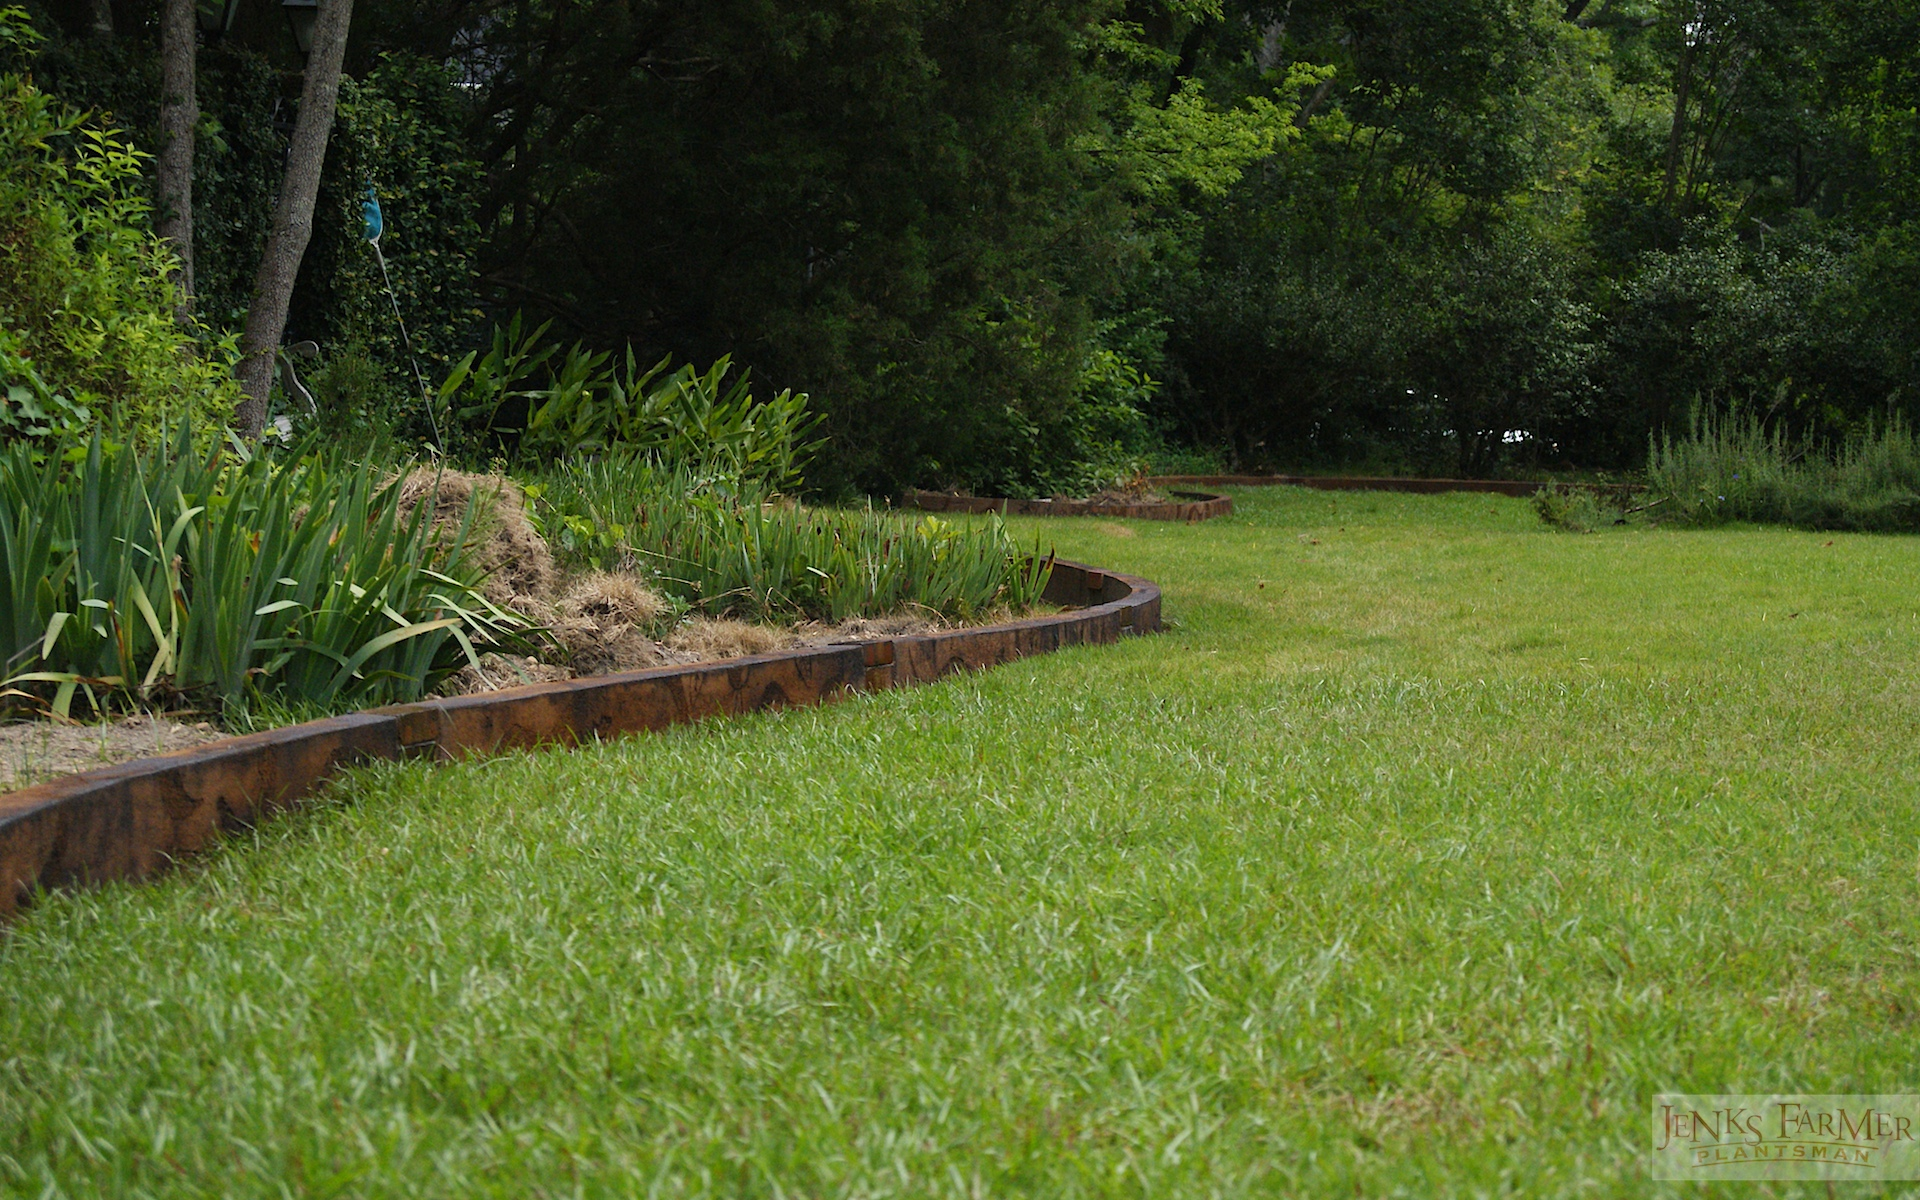 Suburban Backyard Farming : Suburban Gardens We?ve Designed (click to enlarge pics)  Jenks